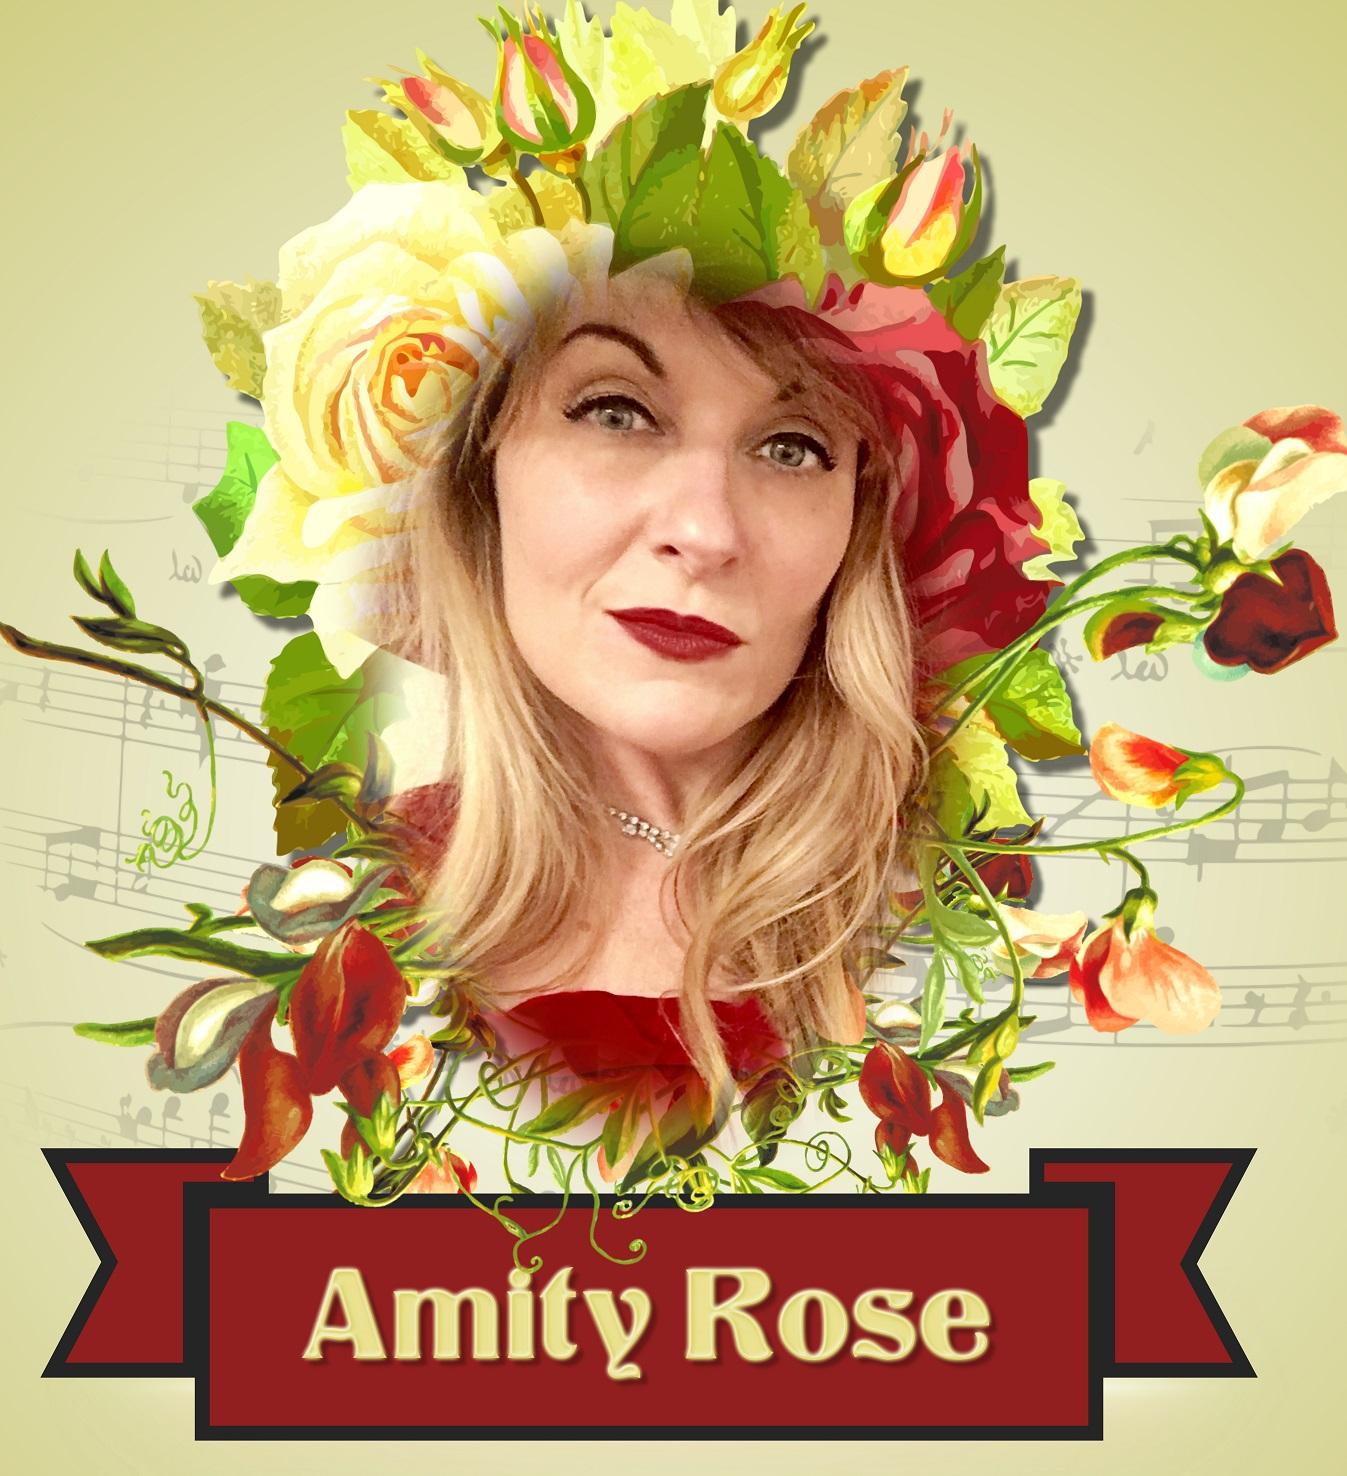 Amity Rose